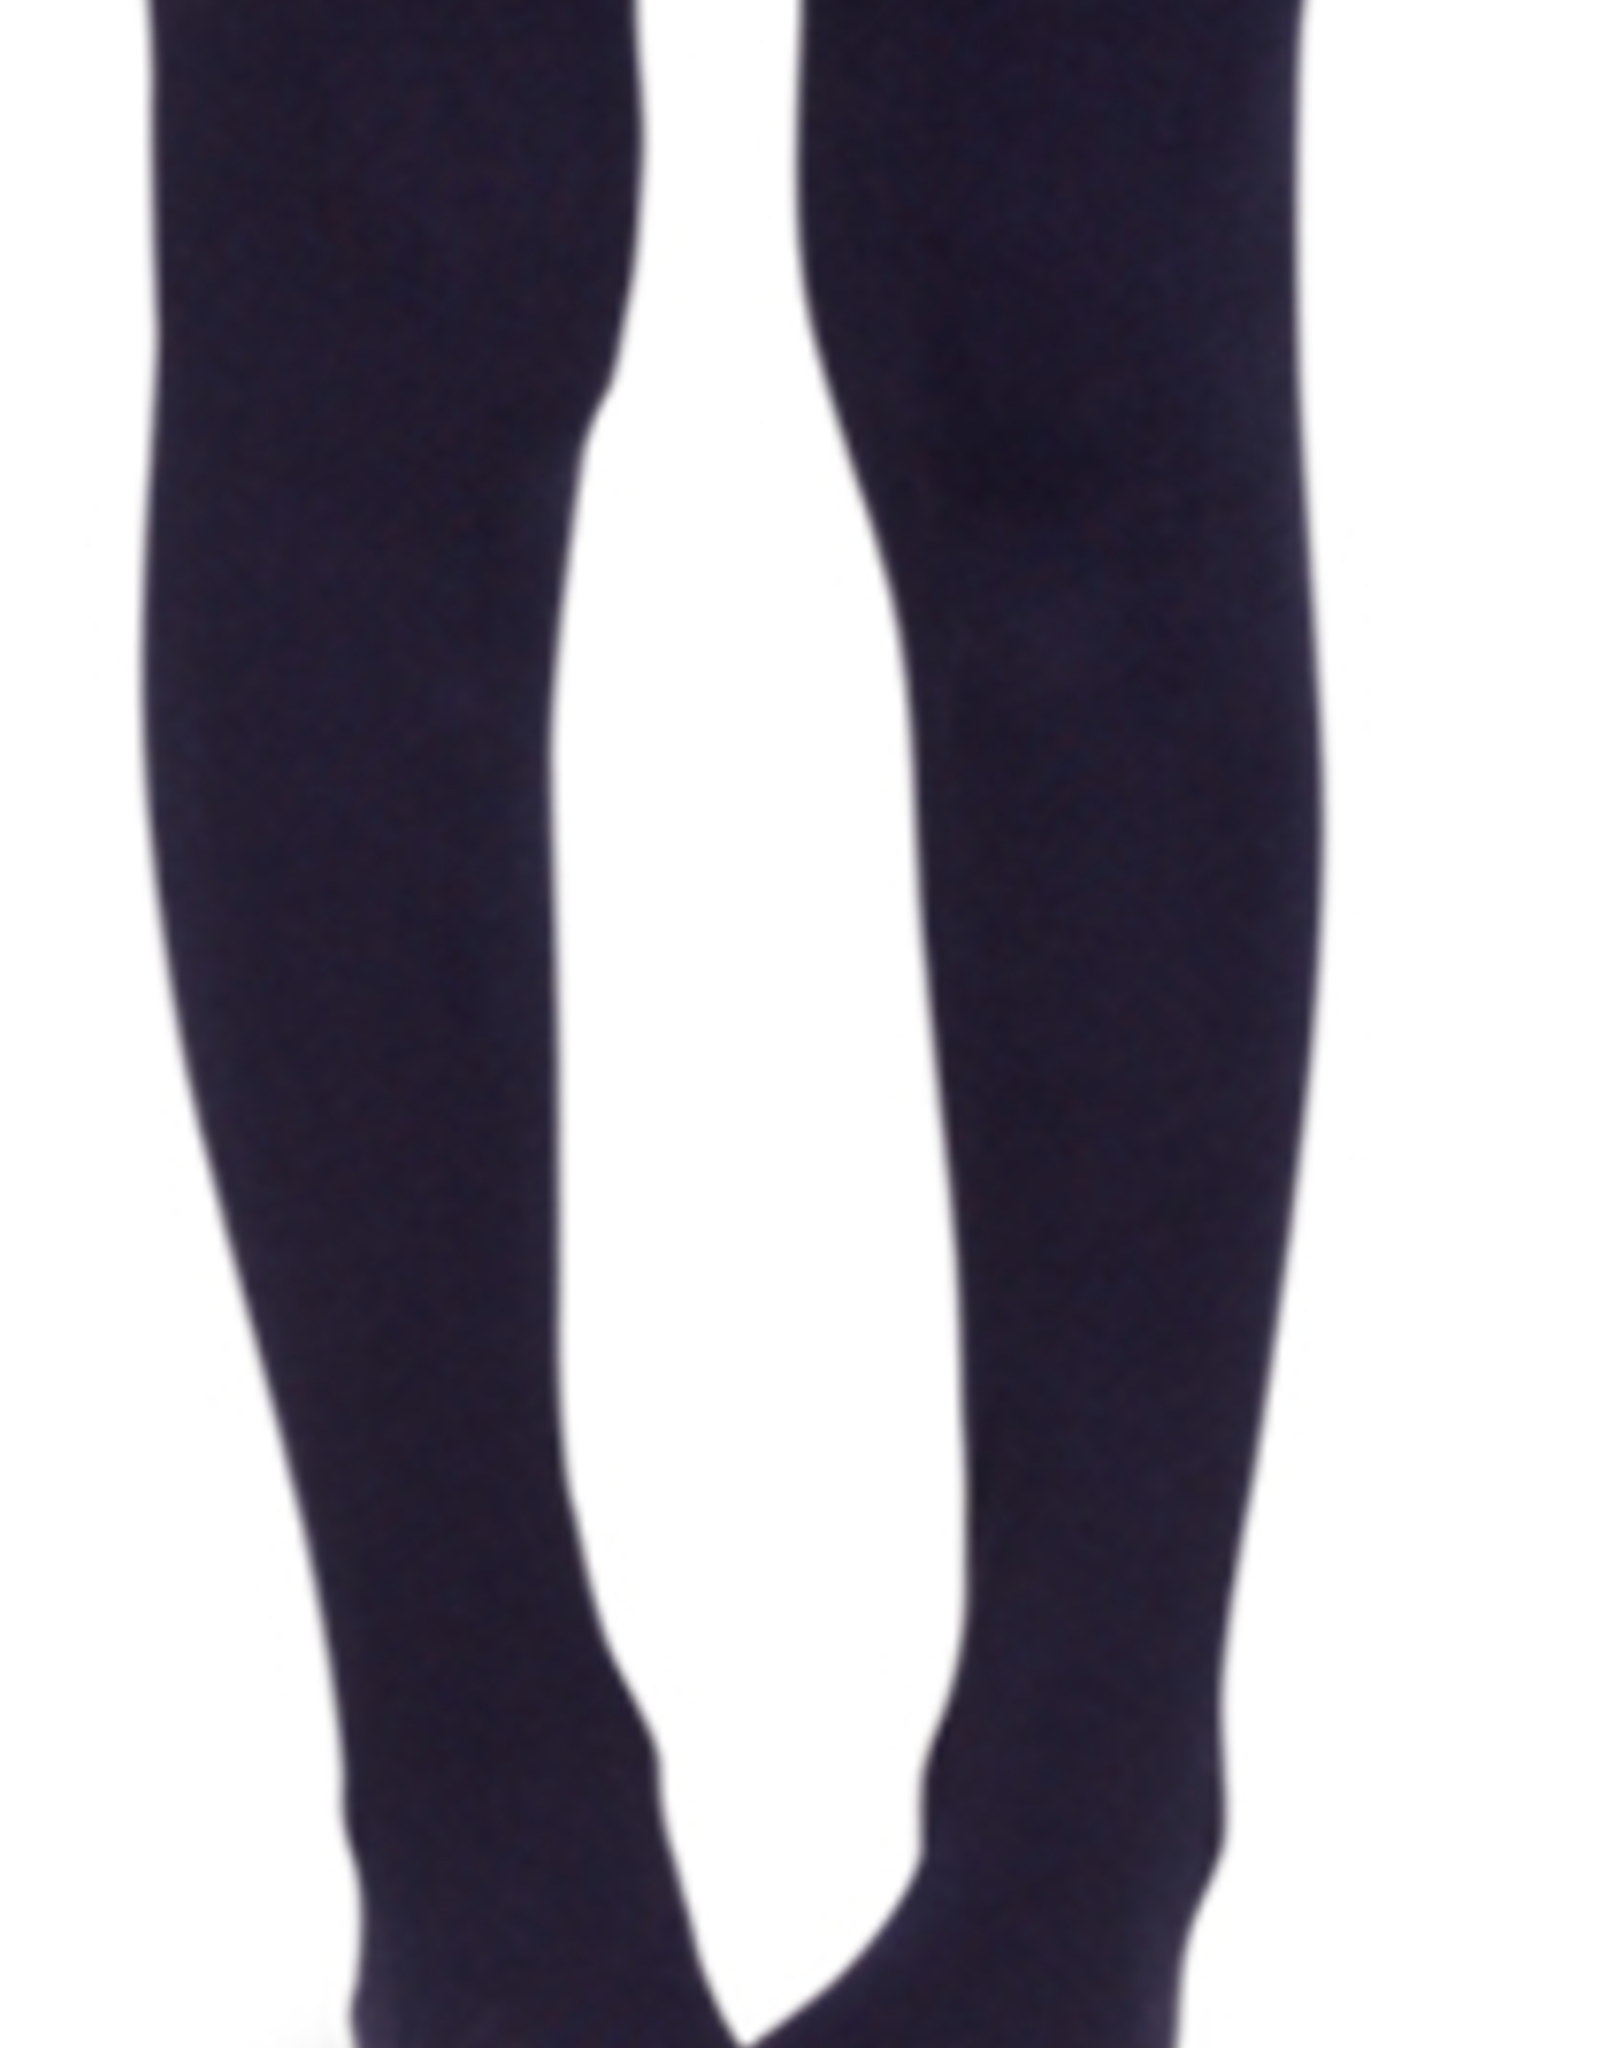 Jefferies Socks School Uniform Smooth Microfiber Legs